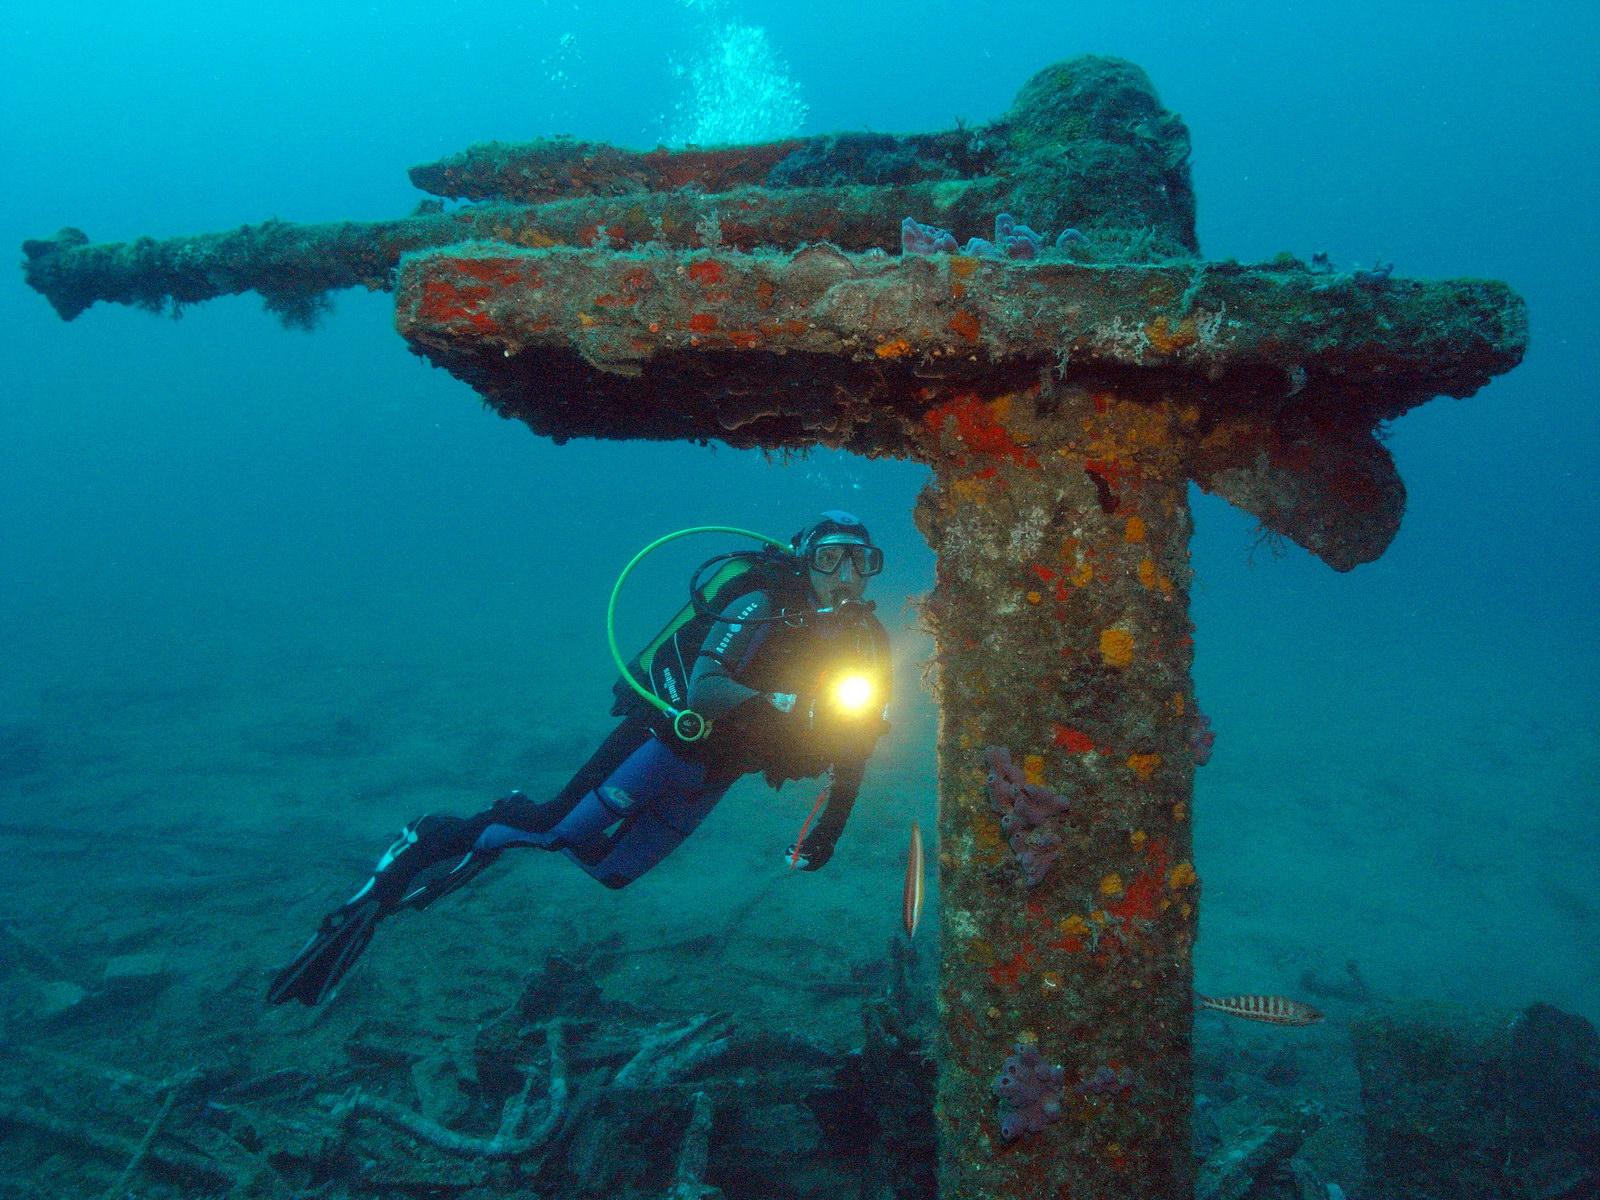 Taucher am Wrack im Mittelmeer